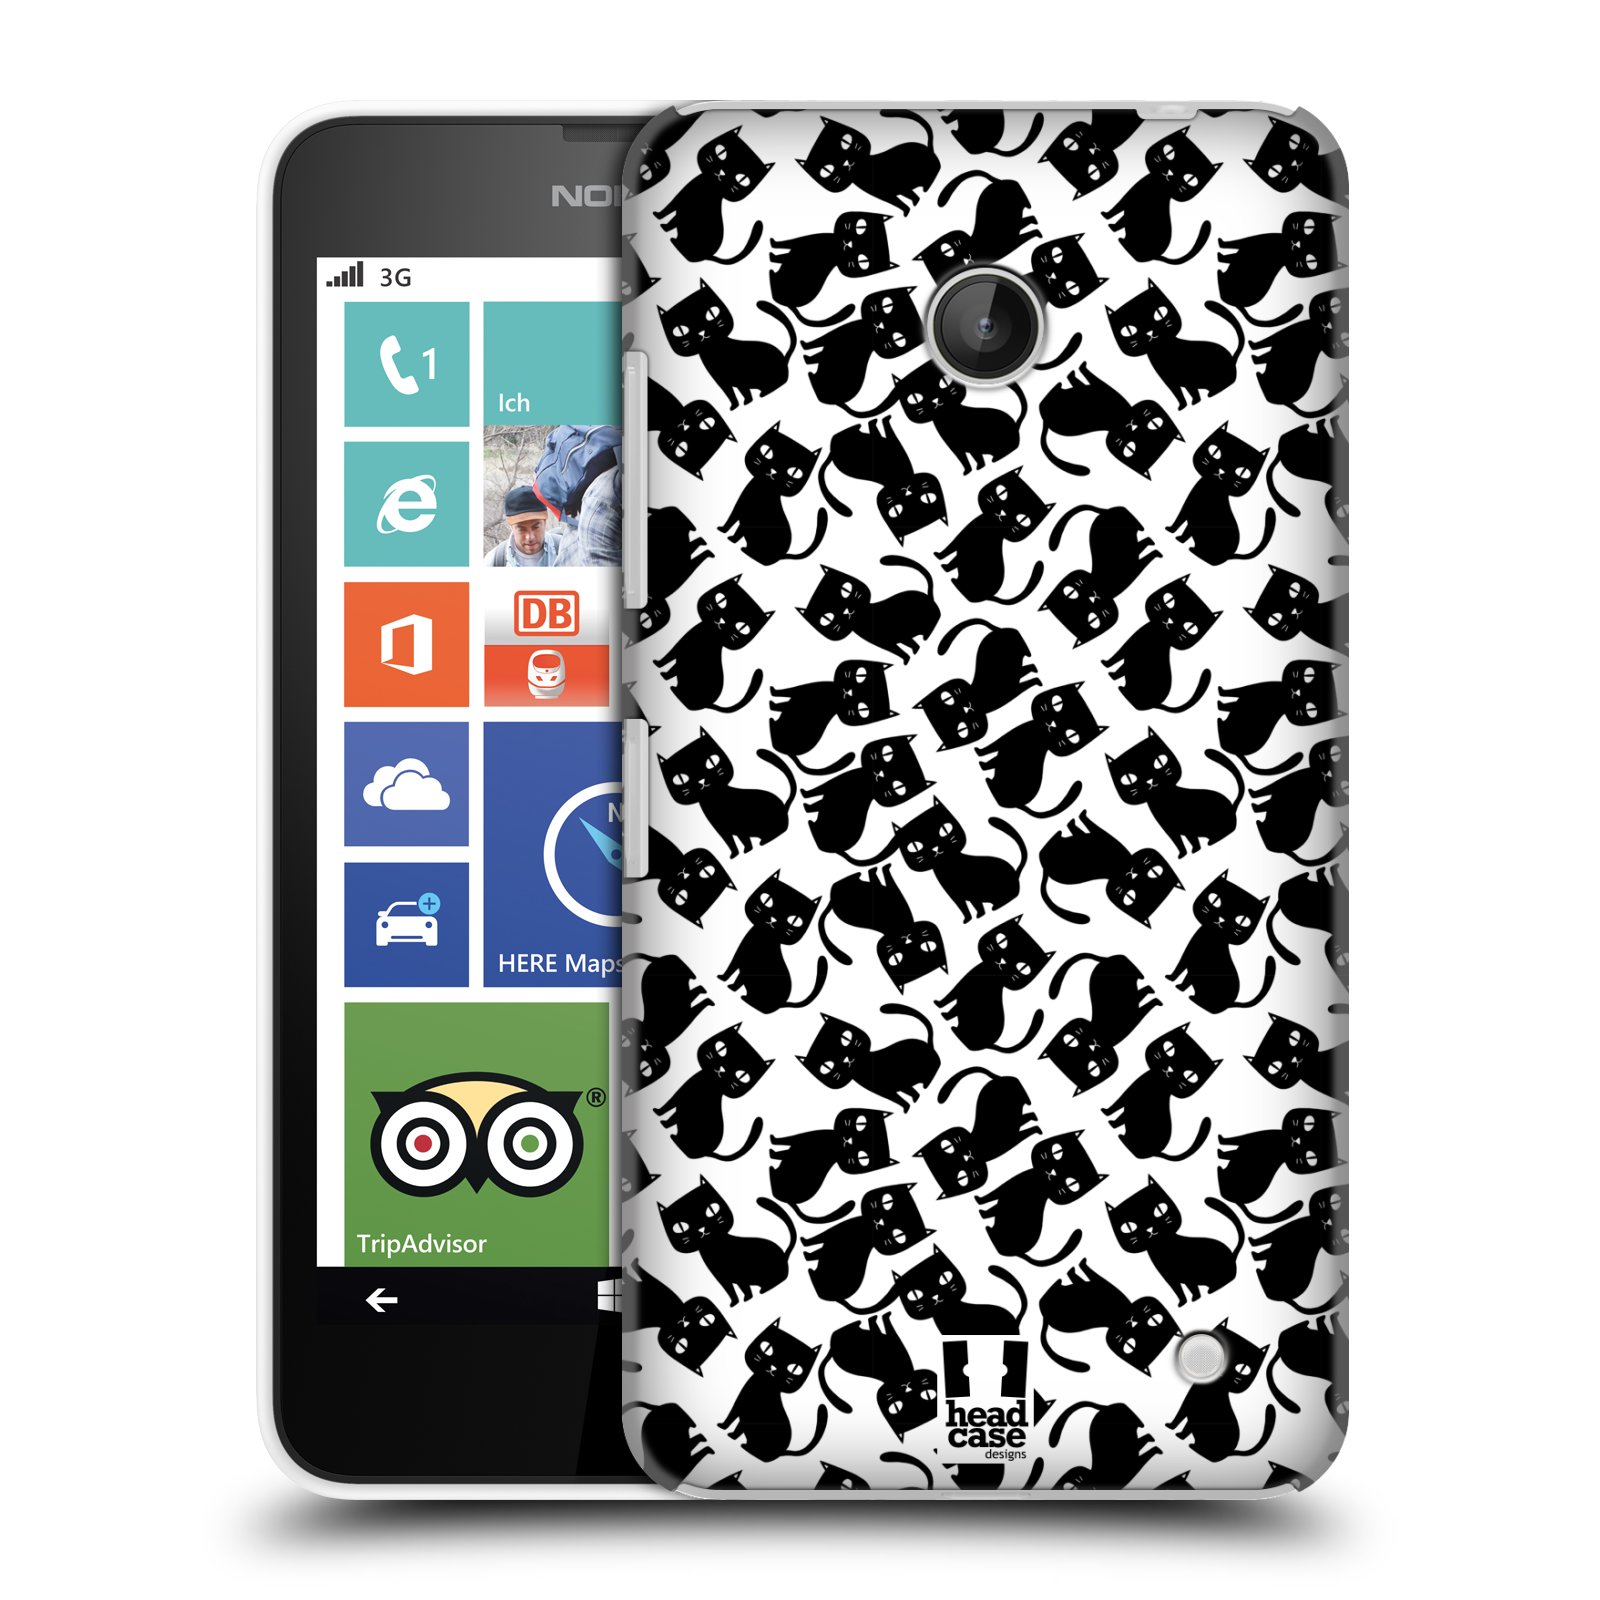 Plastové pouzdro na mobil Nokia Lumia 630 HEAD CASE KOČKY Black Pattern (Kryt či obal na mobilní telefon Nokia Lumia 630 a Nokia Lumia 630 Dual SIM)